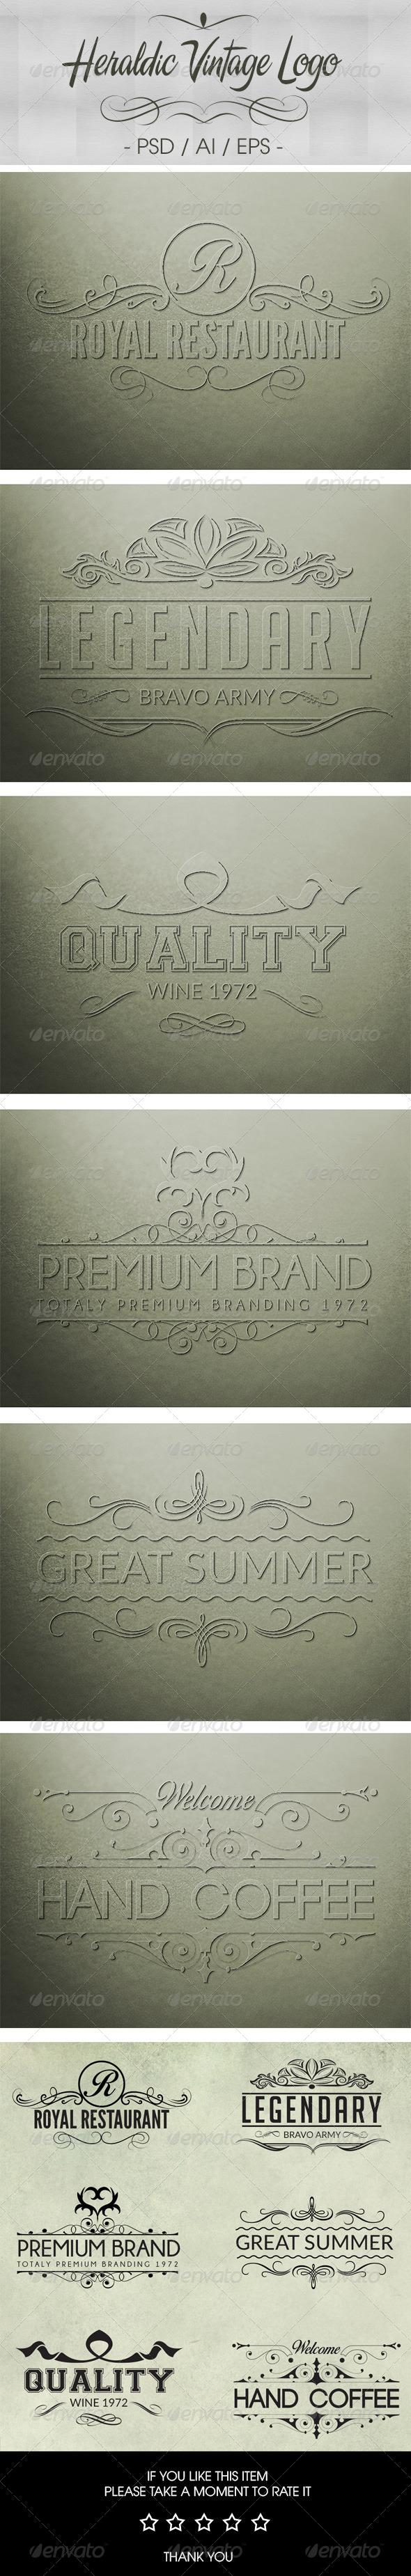 GraphicRiver Heraldic Logos VOL 01 7614220